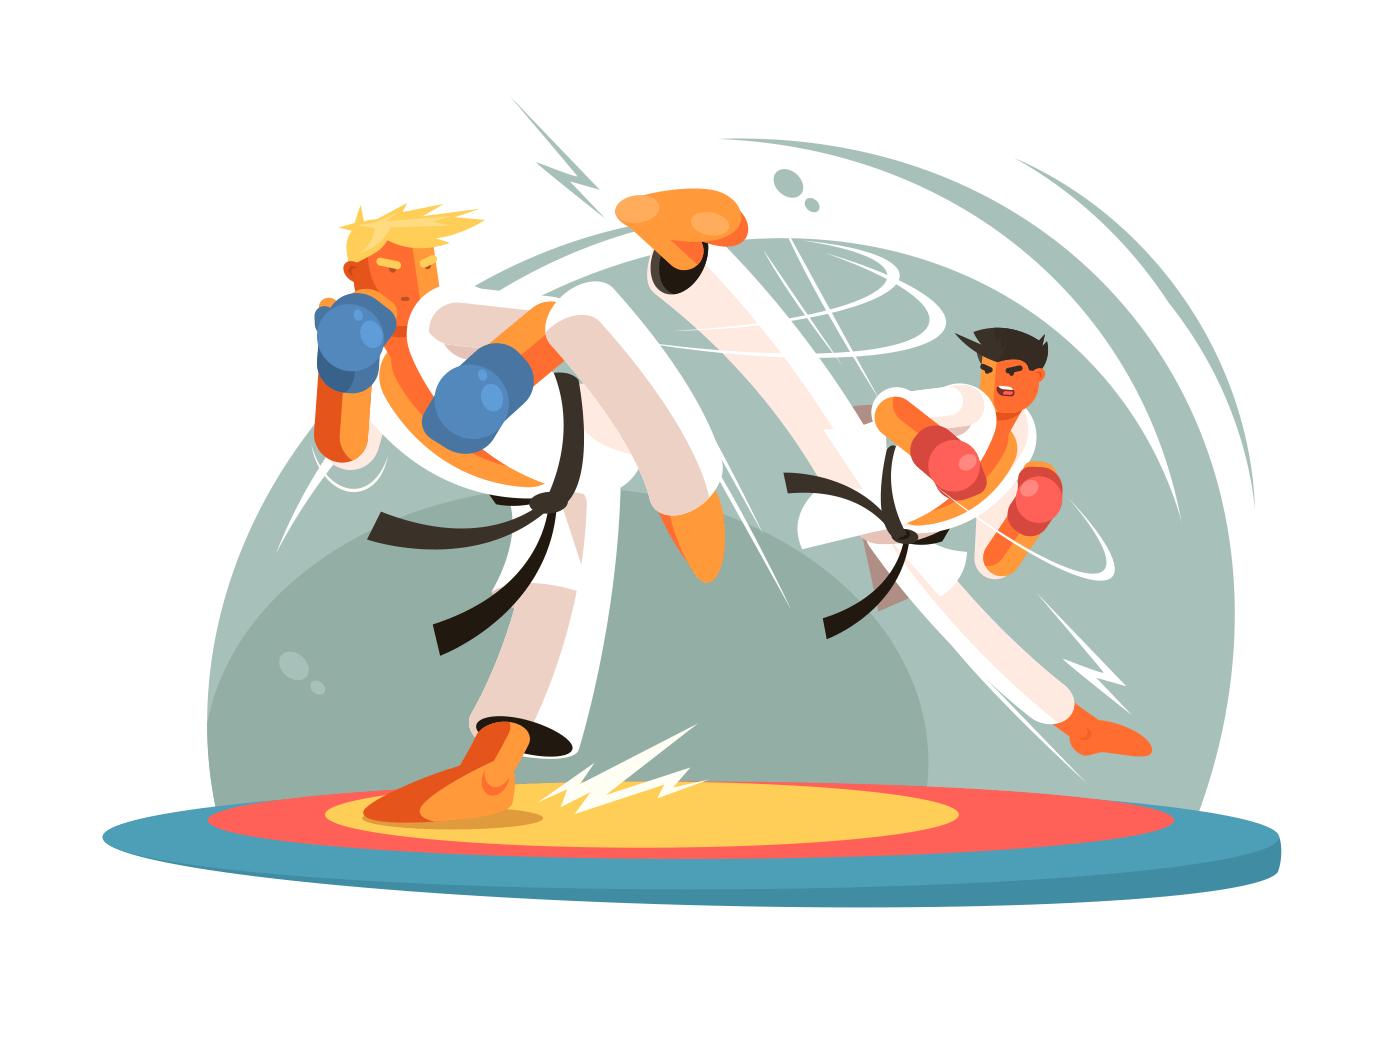 Guys karate sparring for training illustration